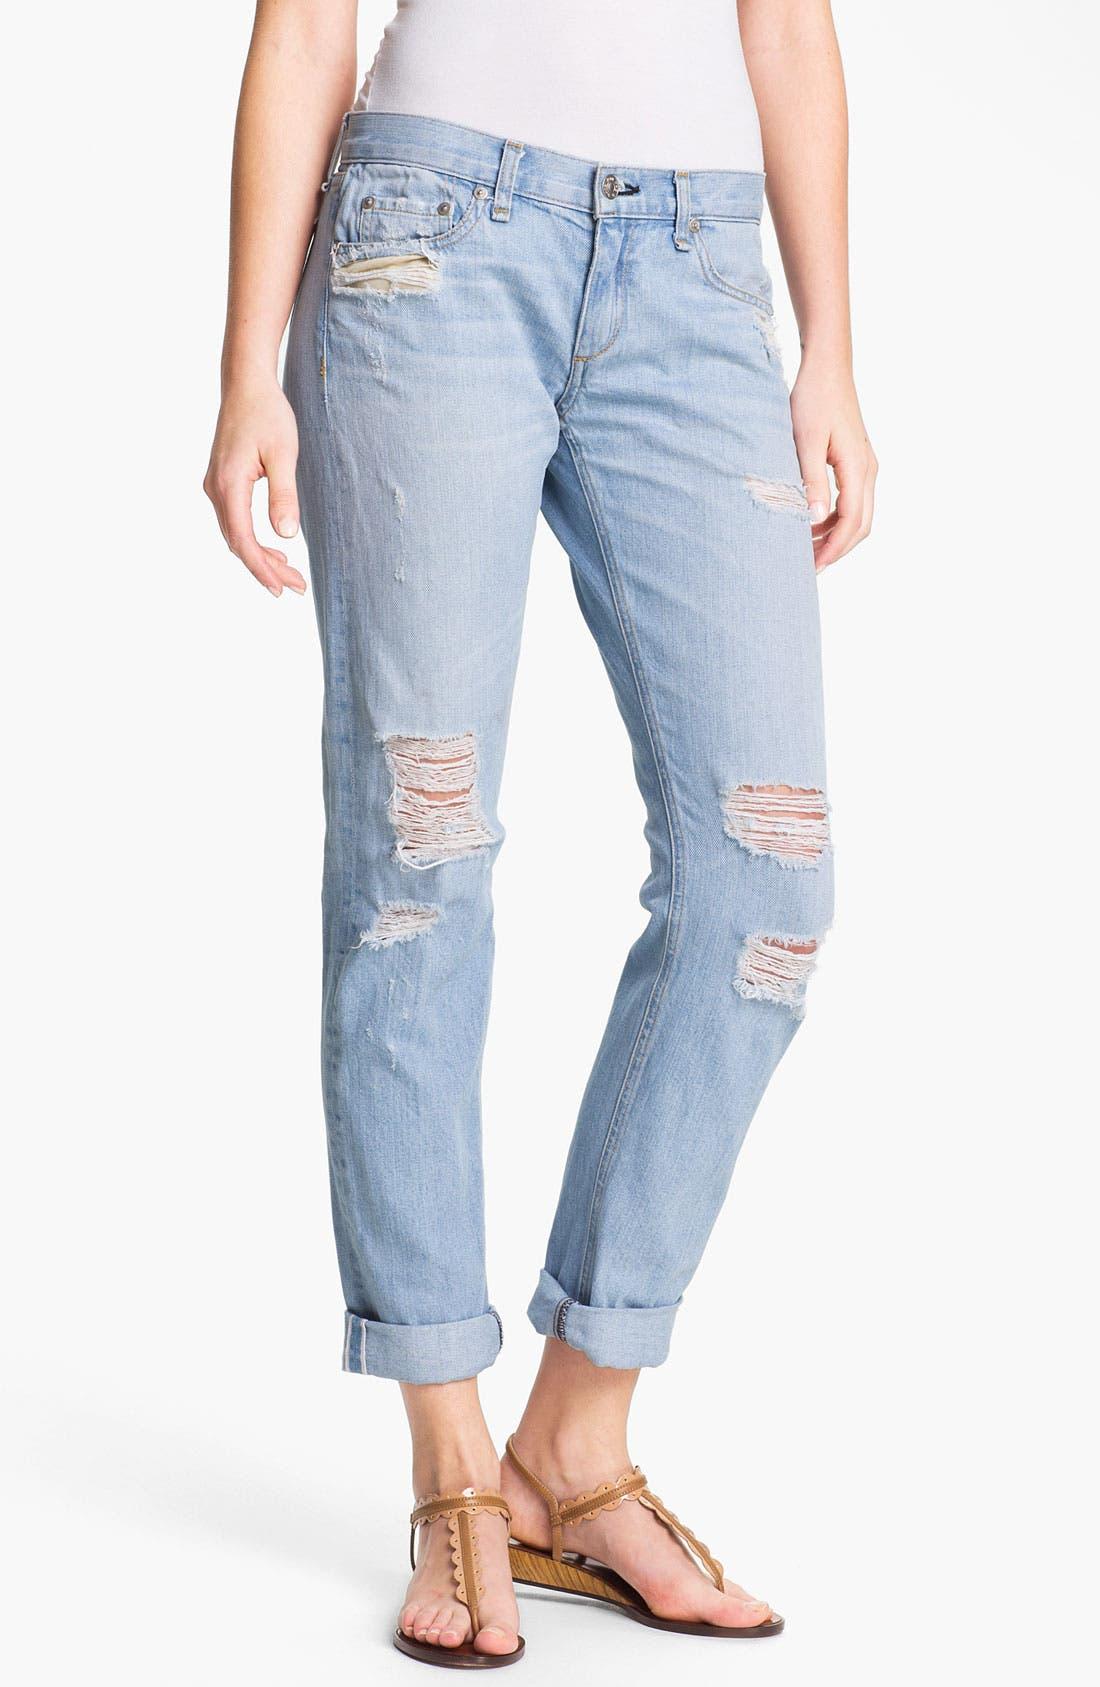 Main Image - rag & bone/JEAN 'The Boyfriend' Selvedge Denim Jeans